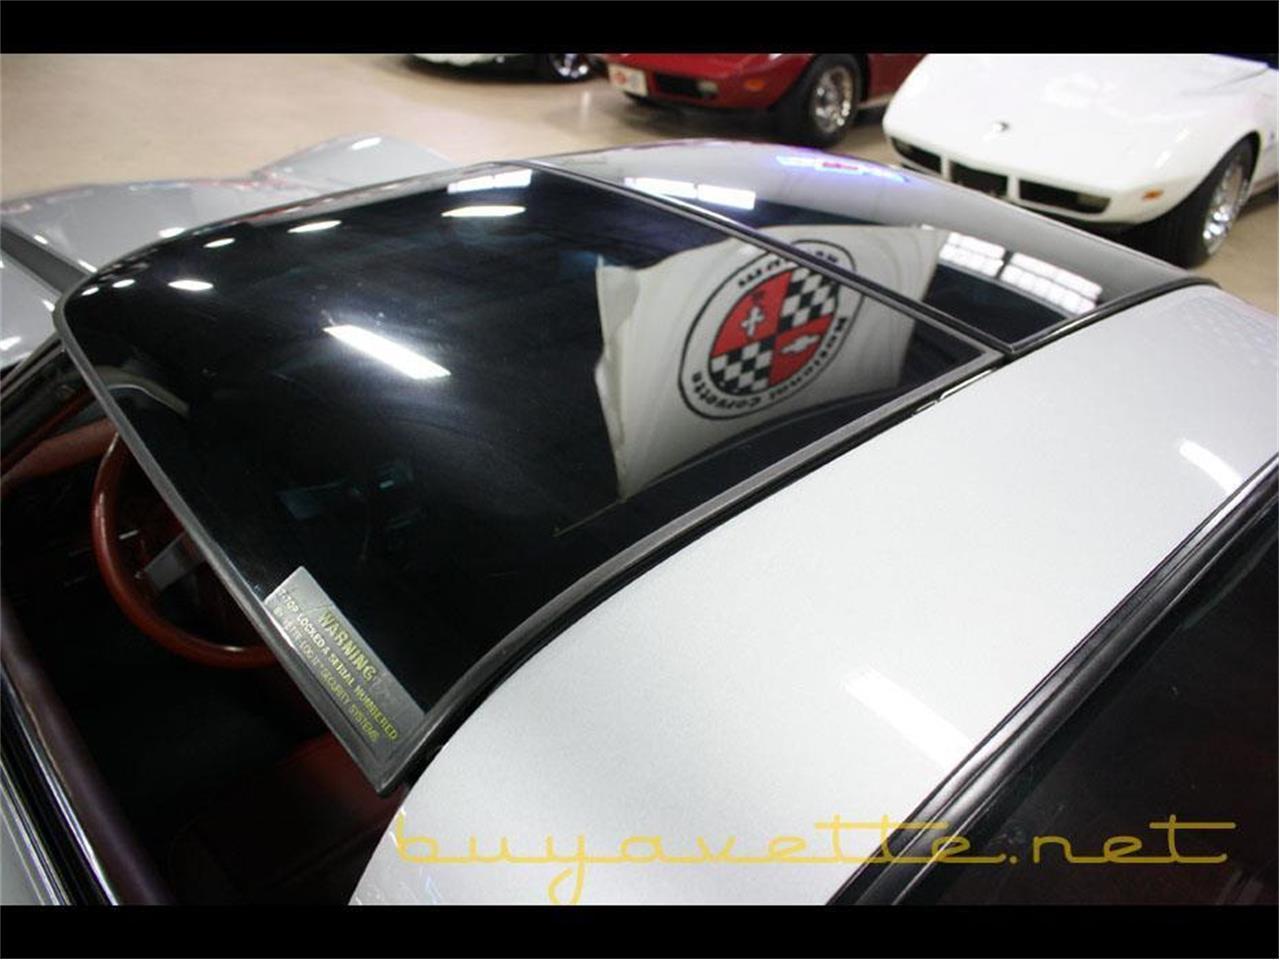 Large Picture of '78 Chevrolet Corvette located in Georgia - $19,999.00 - R10M